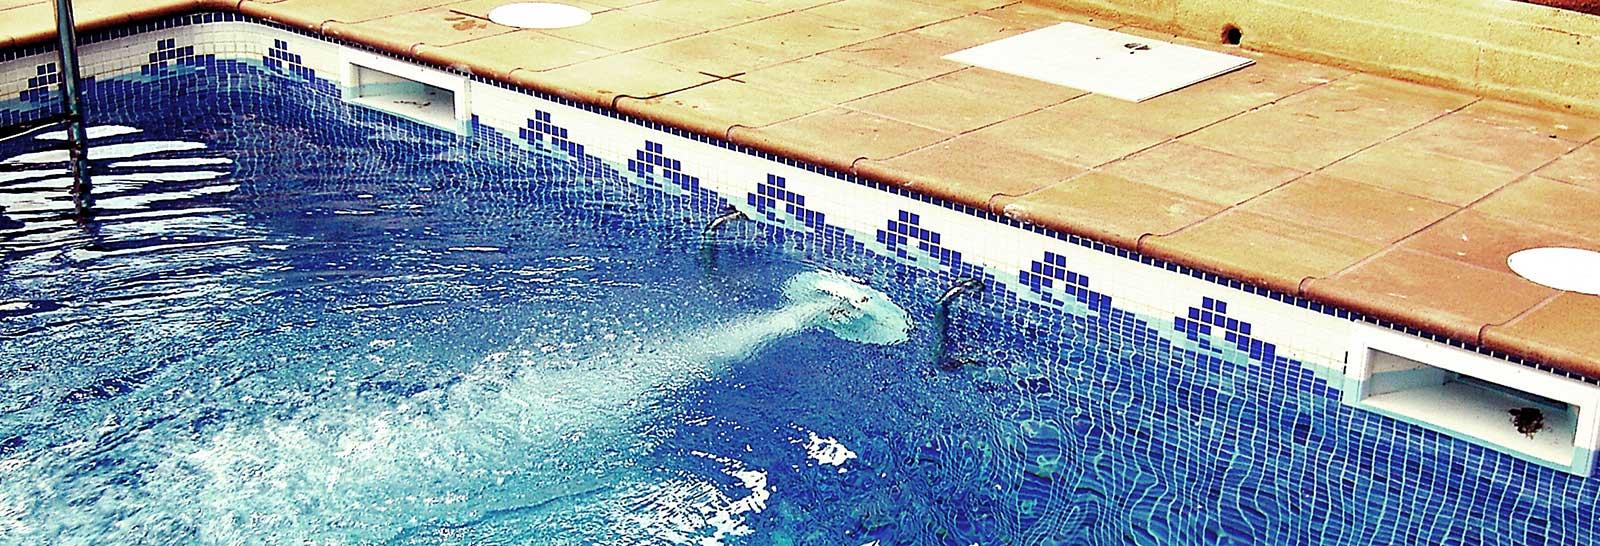 aguaviva-piscinas-sli-06